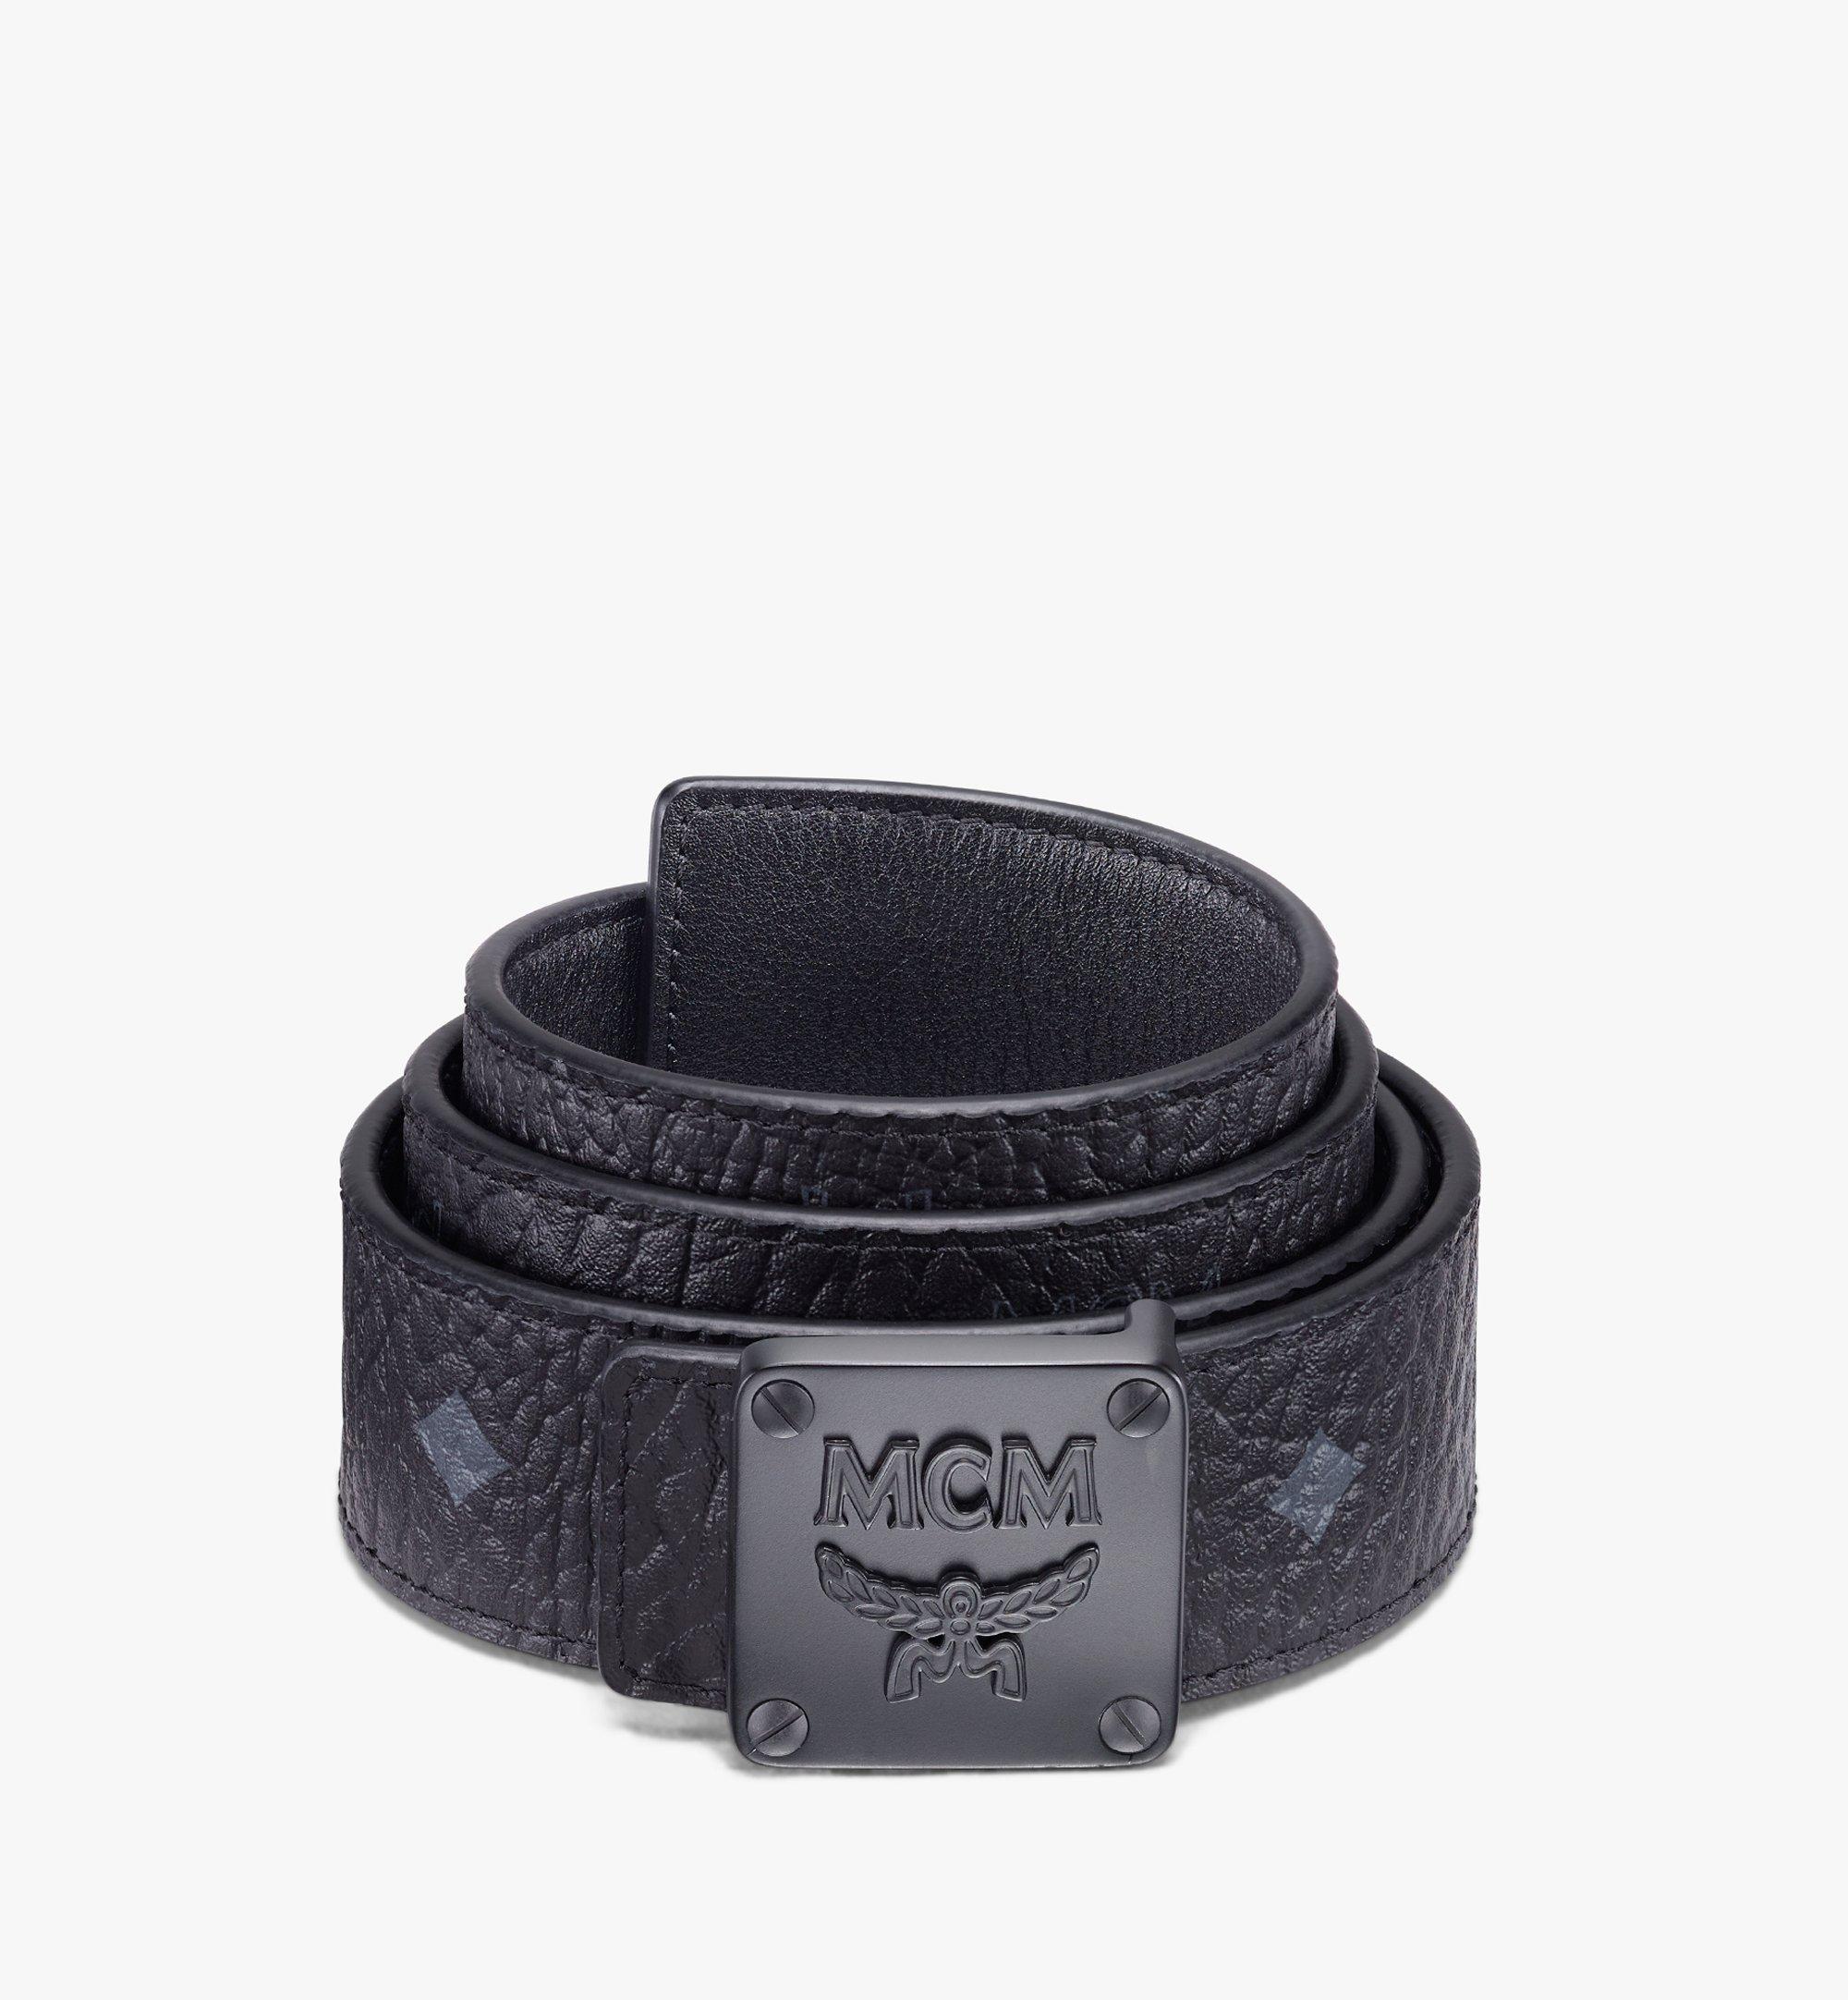 "MCM MCM Collection Reversible Belt 1.5"" in Visetos Black MYBASMM03BK001 Alternate View 1"